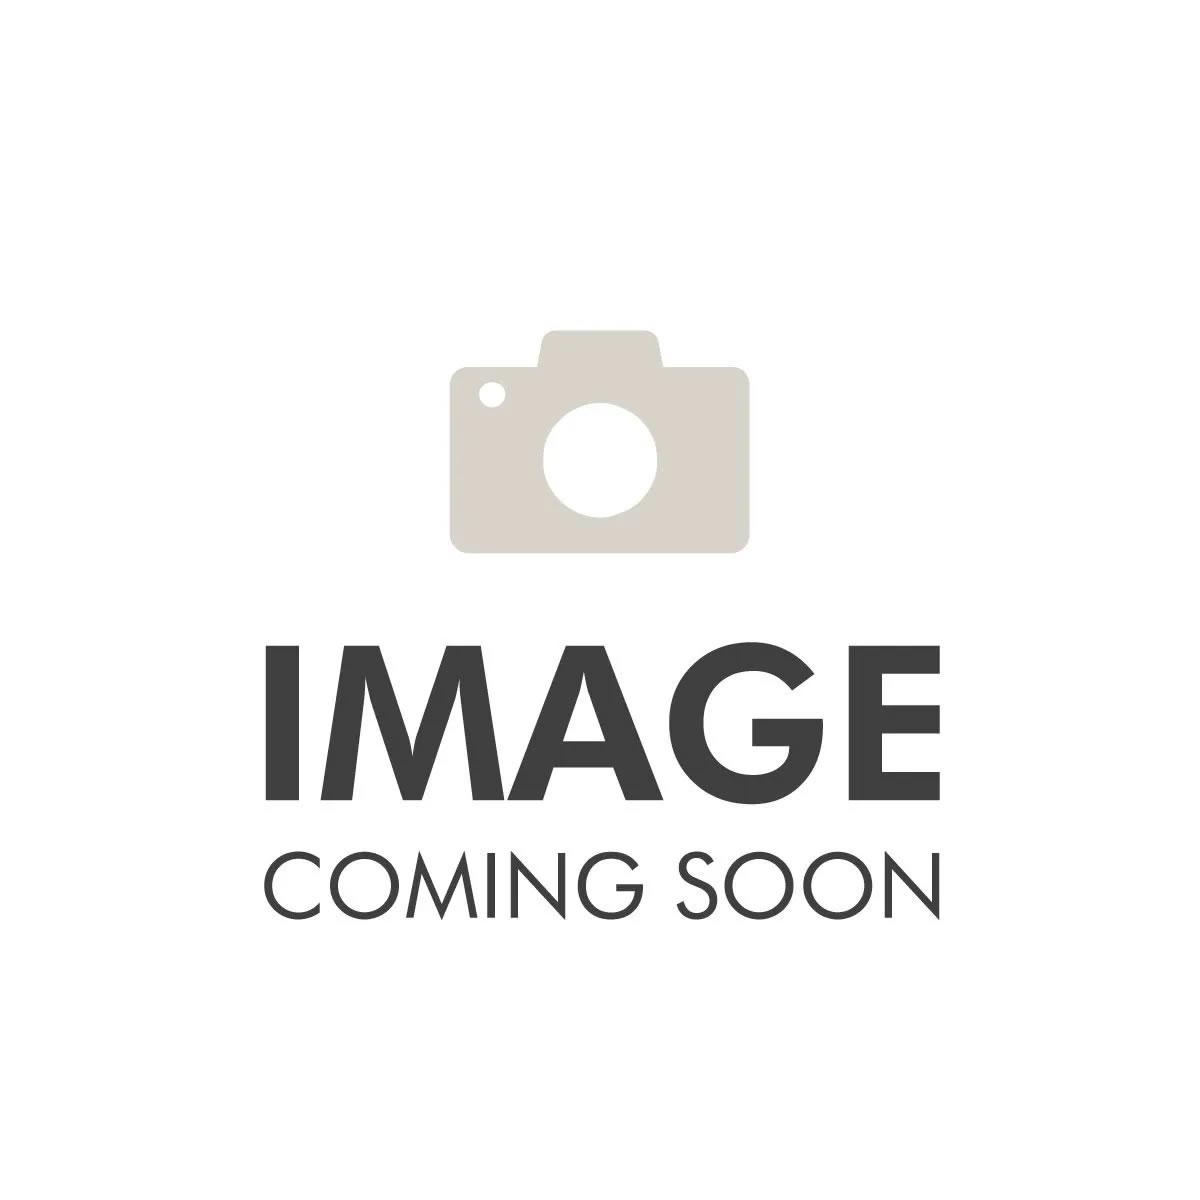 Grille Inserts Black 97-06 Jeep TJ And LJ Wrangler